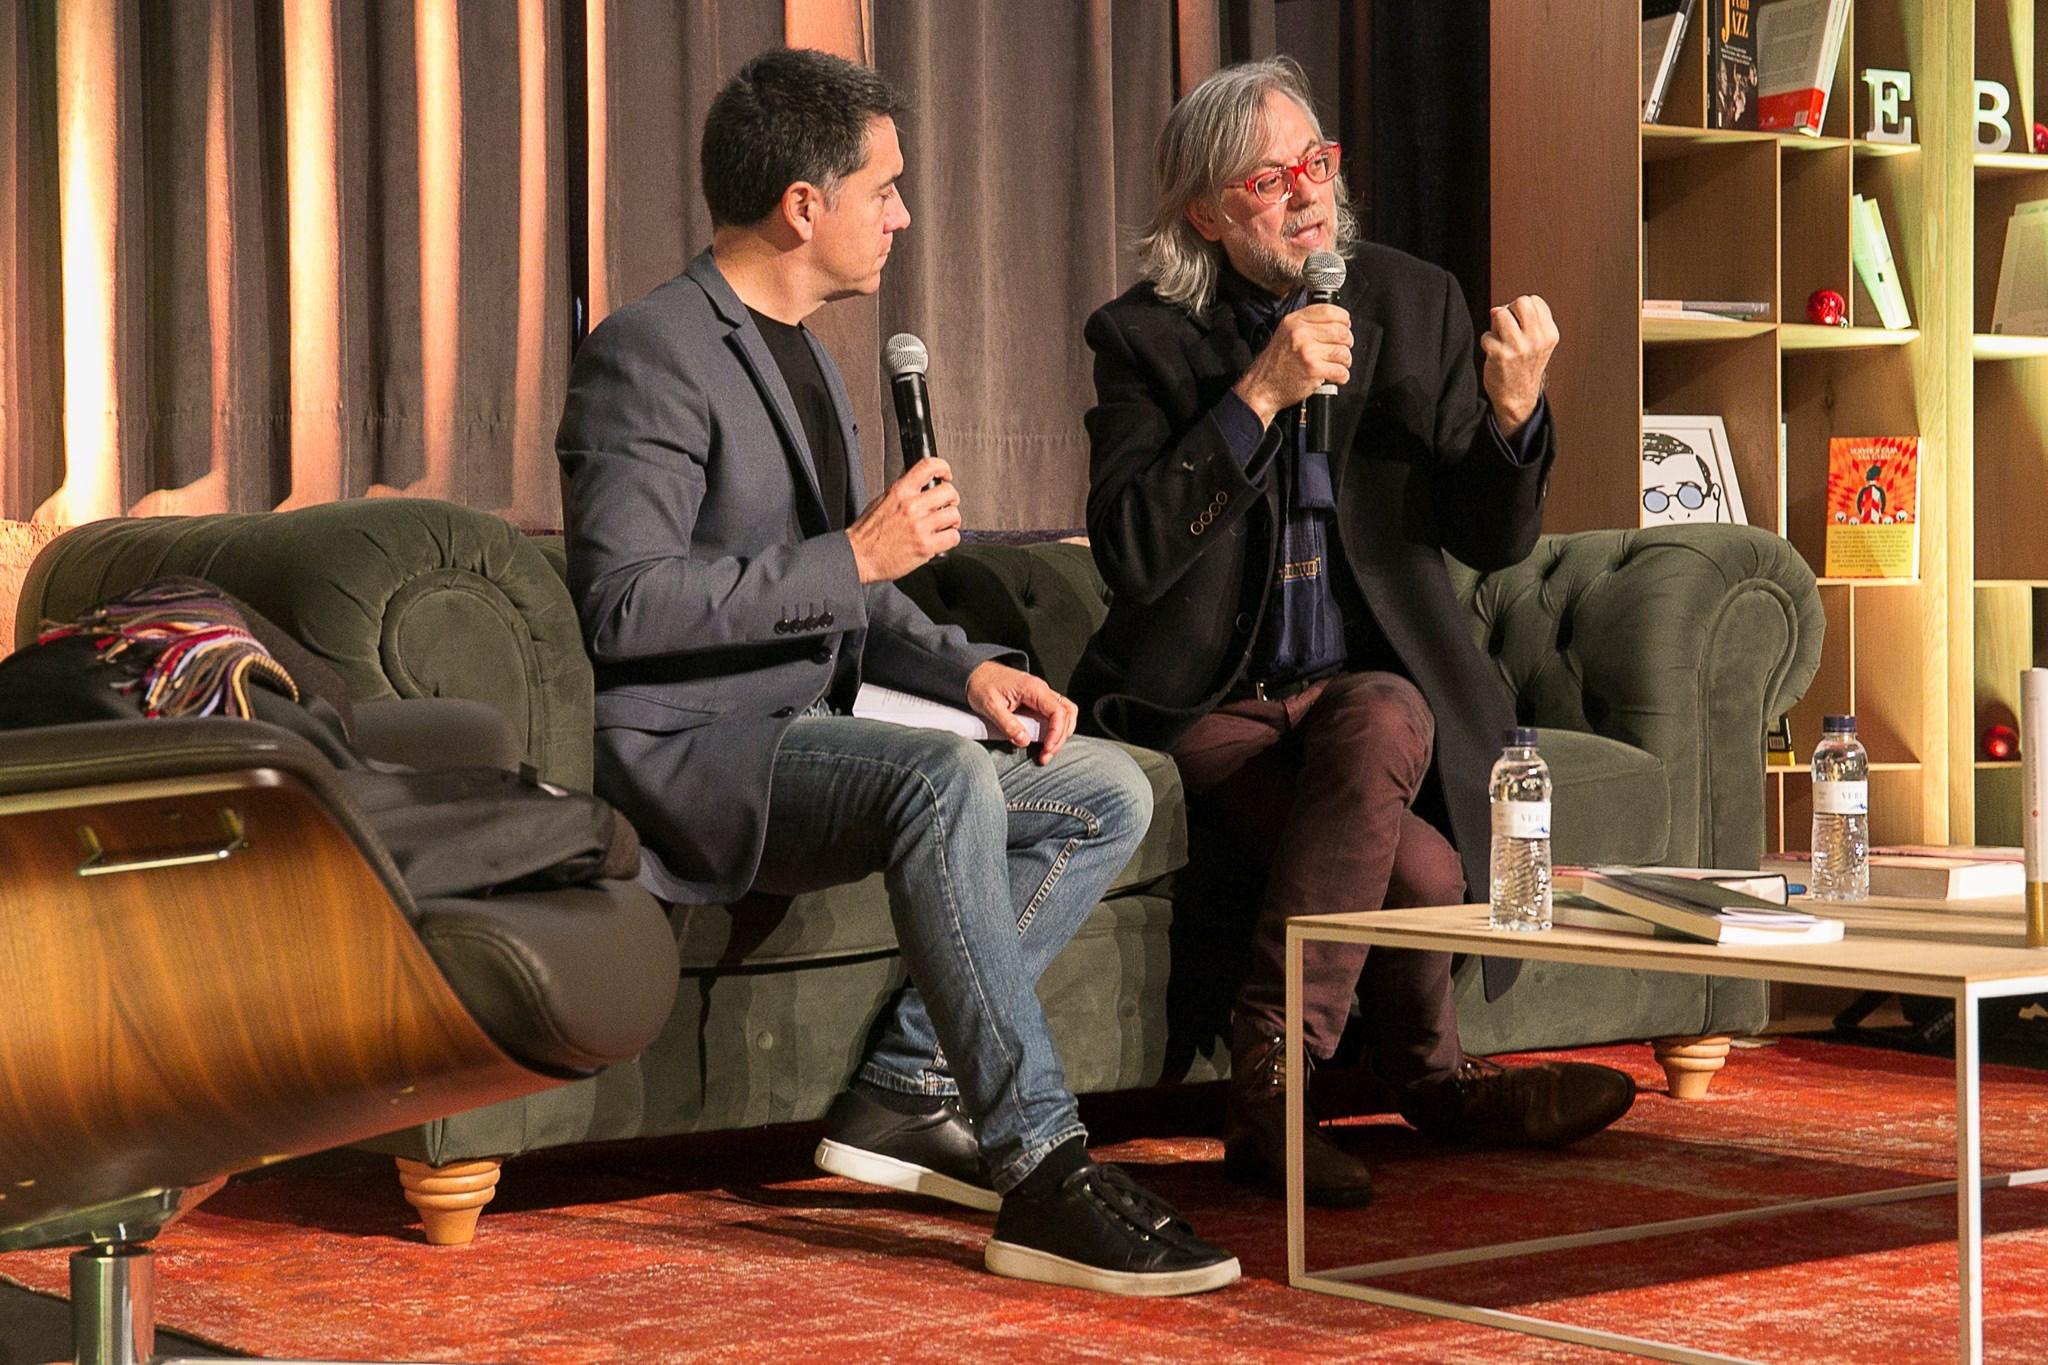 Protagonistes de la h(h)istòria amb Víctor Amela i Martí Gironell